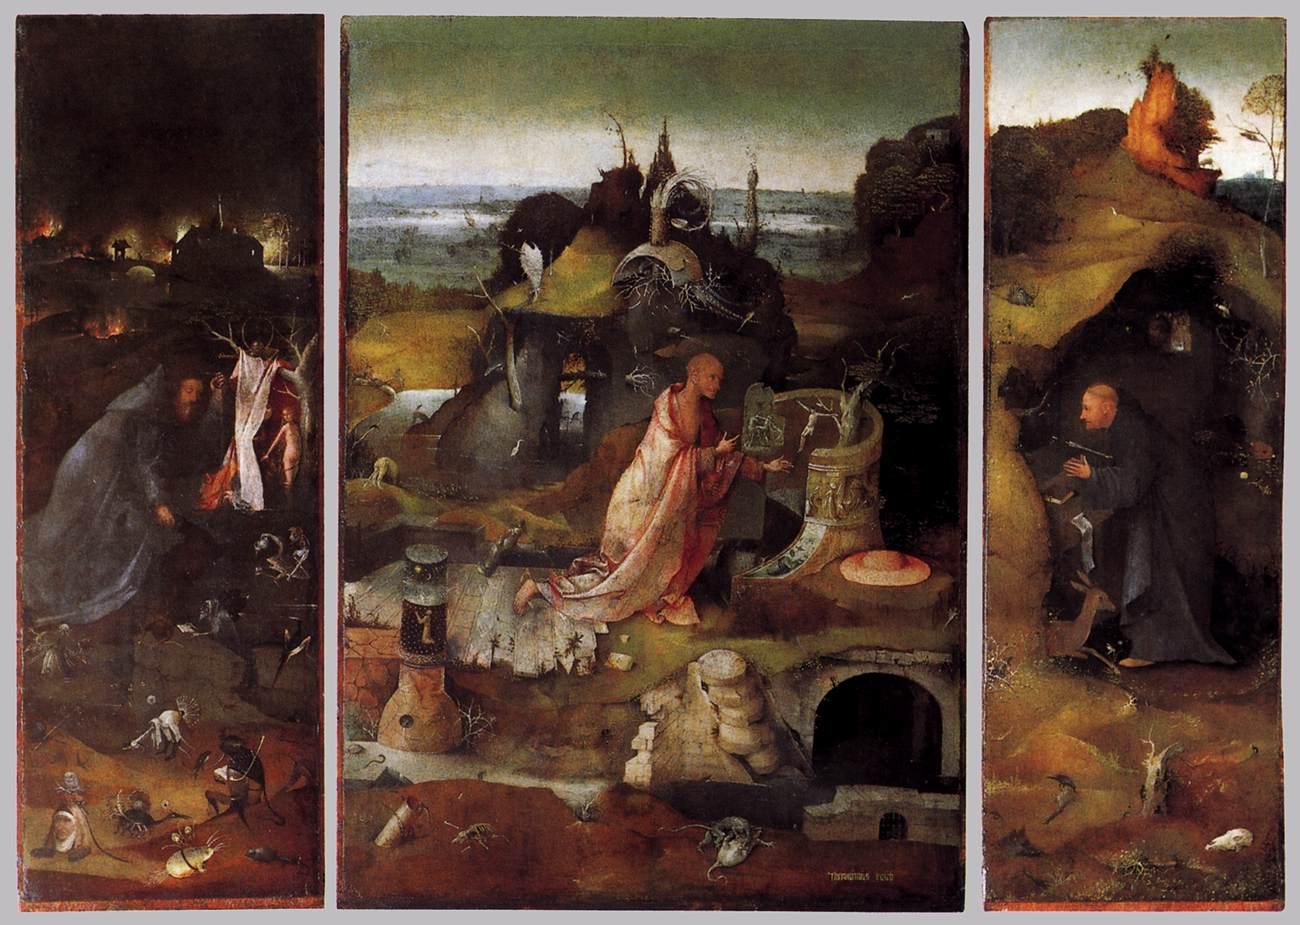 The Hermit Saints by Hieronymus Bosch